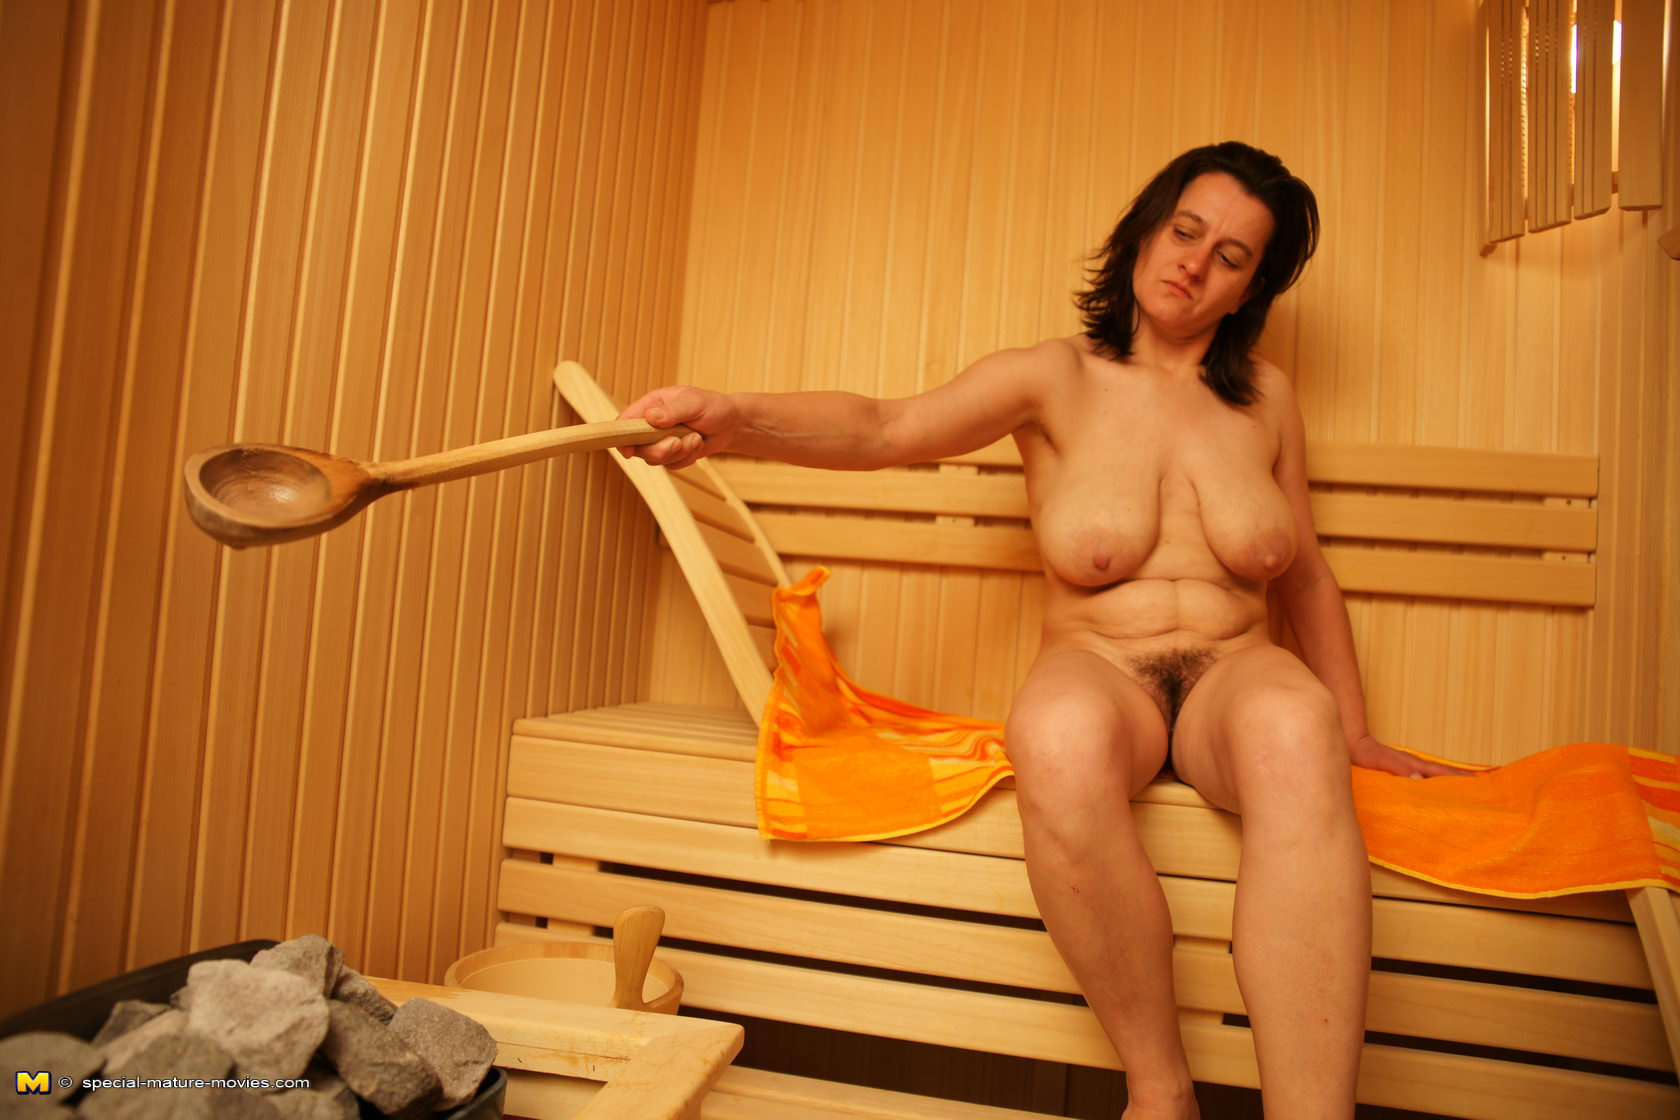 Nud pics of adrienne janic